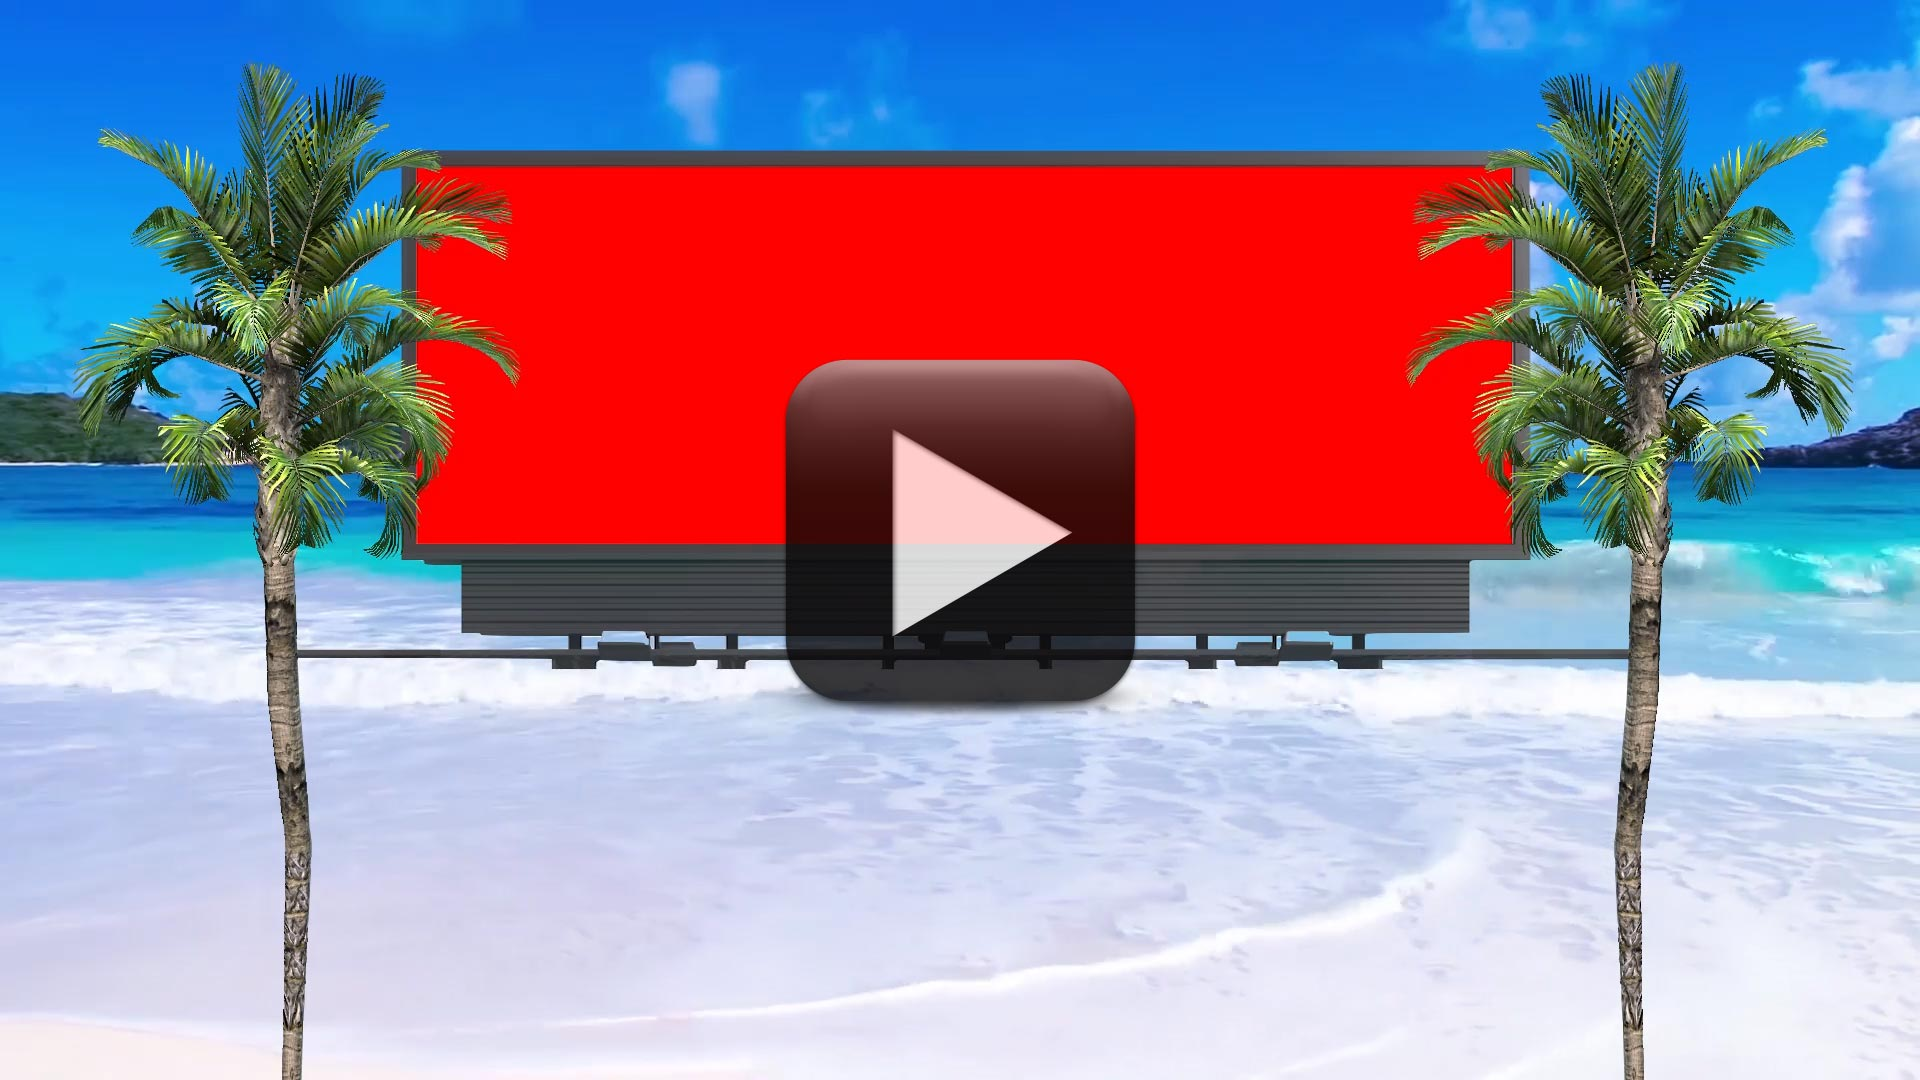 Premium HD Video Backgrounds - Wedding Frame